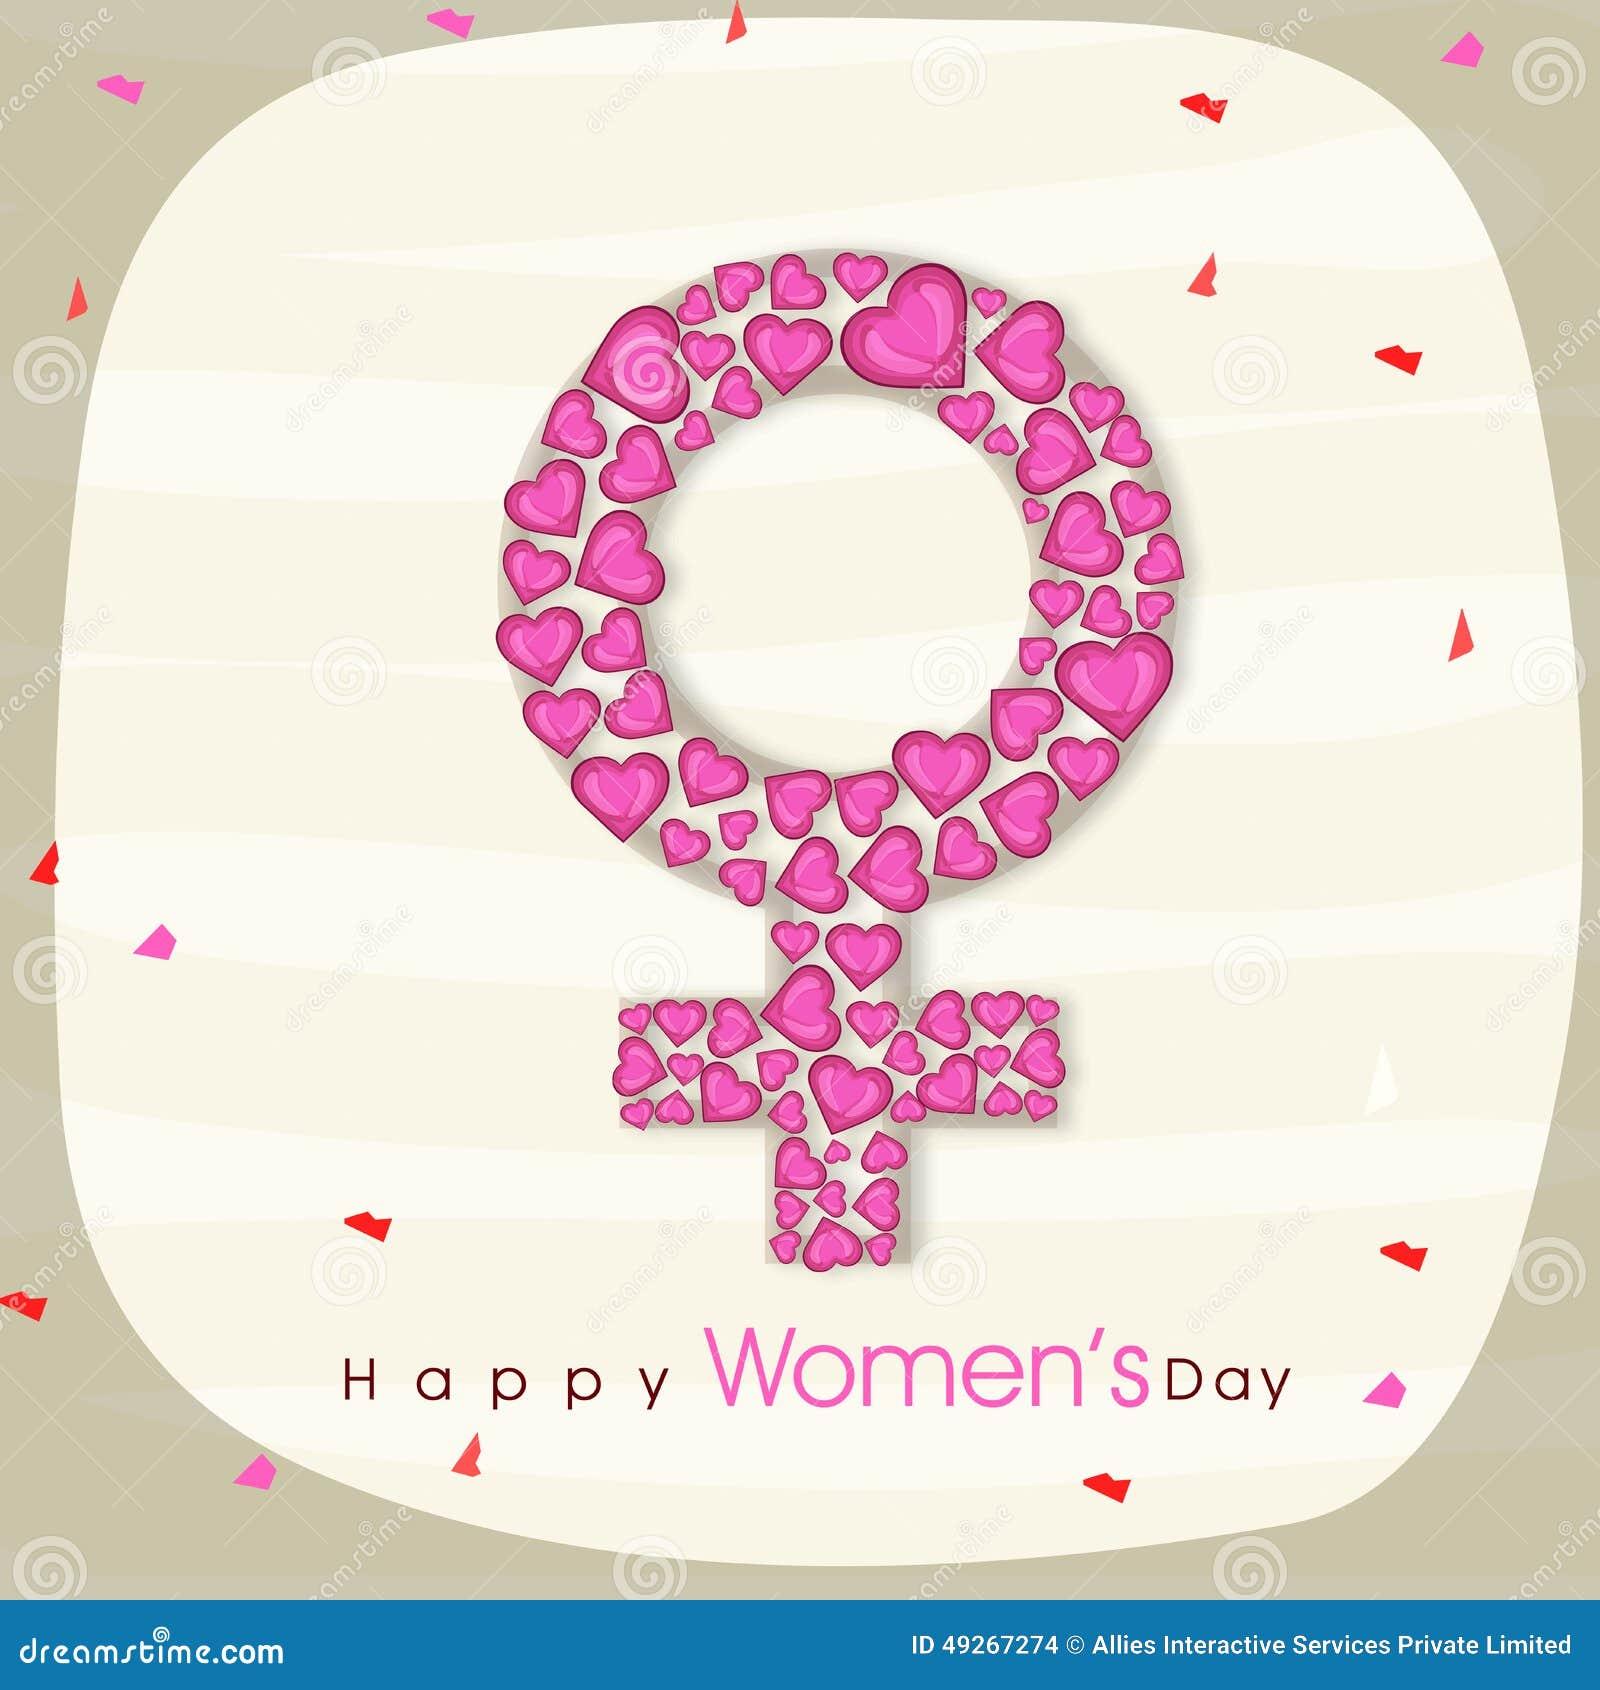 Female symbol for international womens day celebration stock female symbol for international womens day celebration biocorpaavc Choice Image